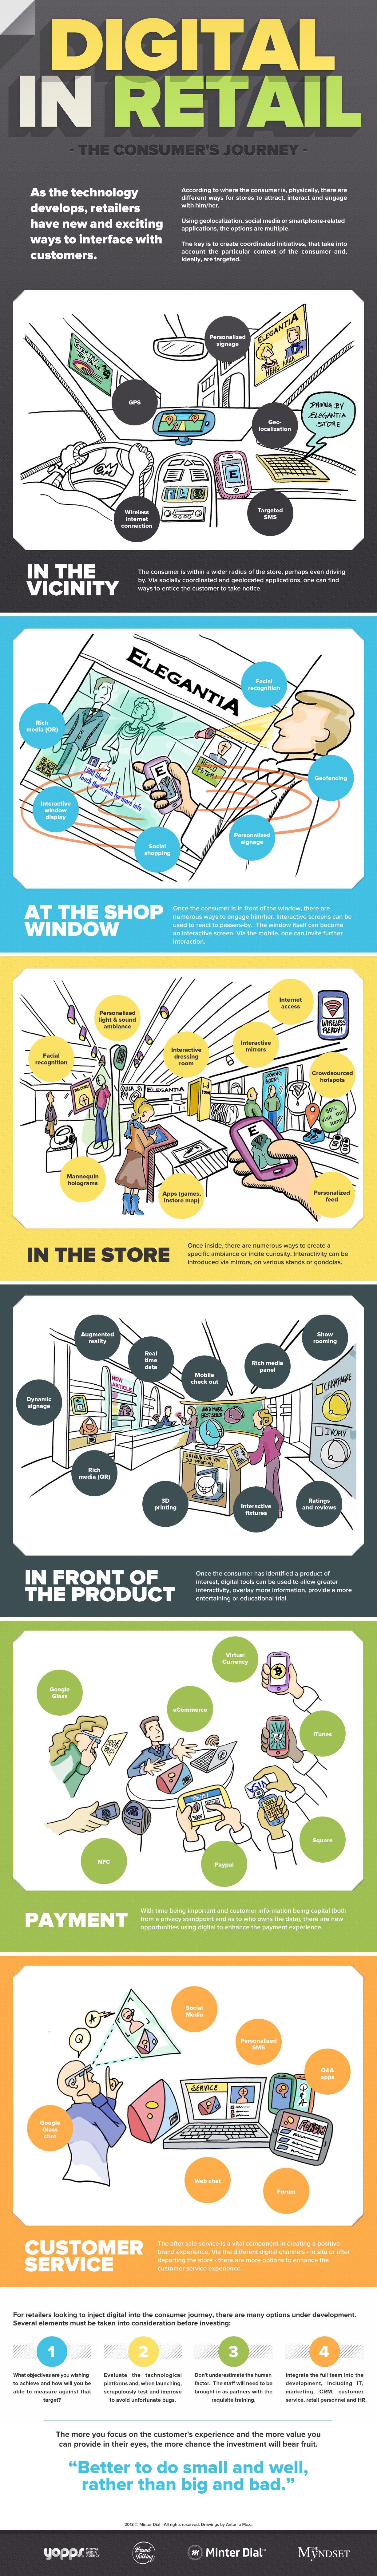 Digital in Retail Infographic, The Myndset digital marketing